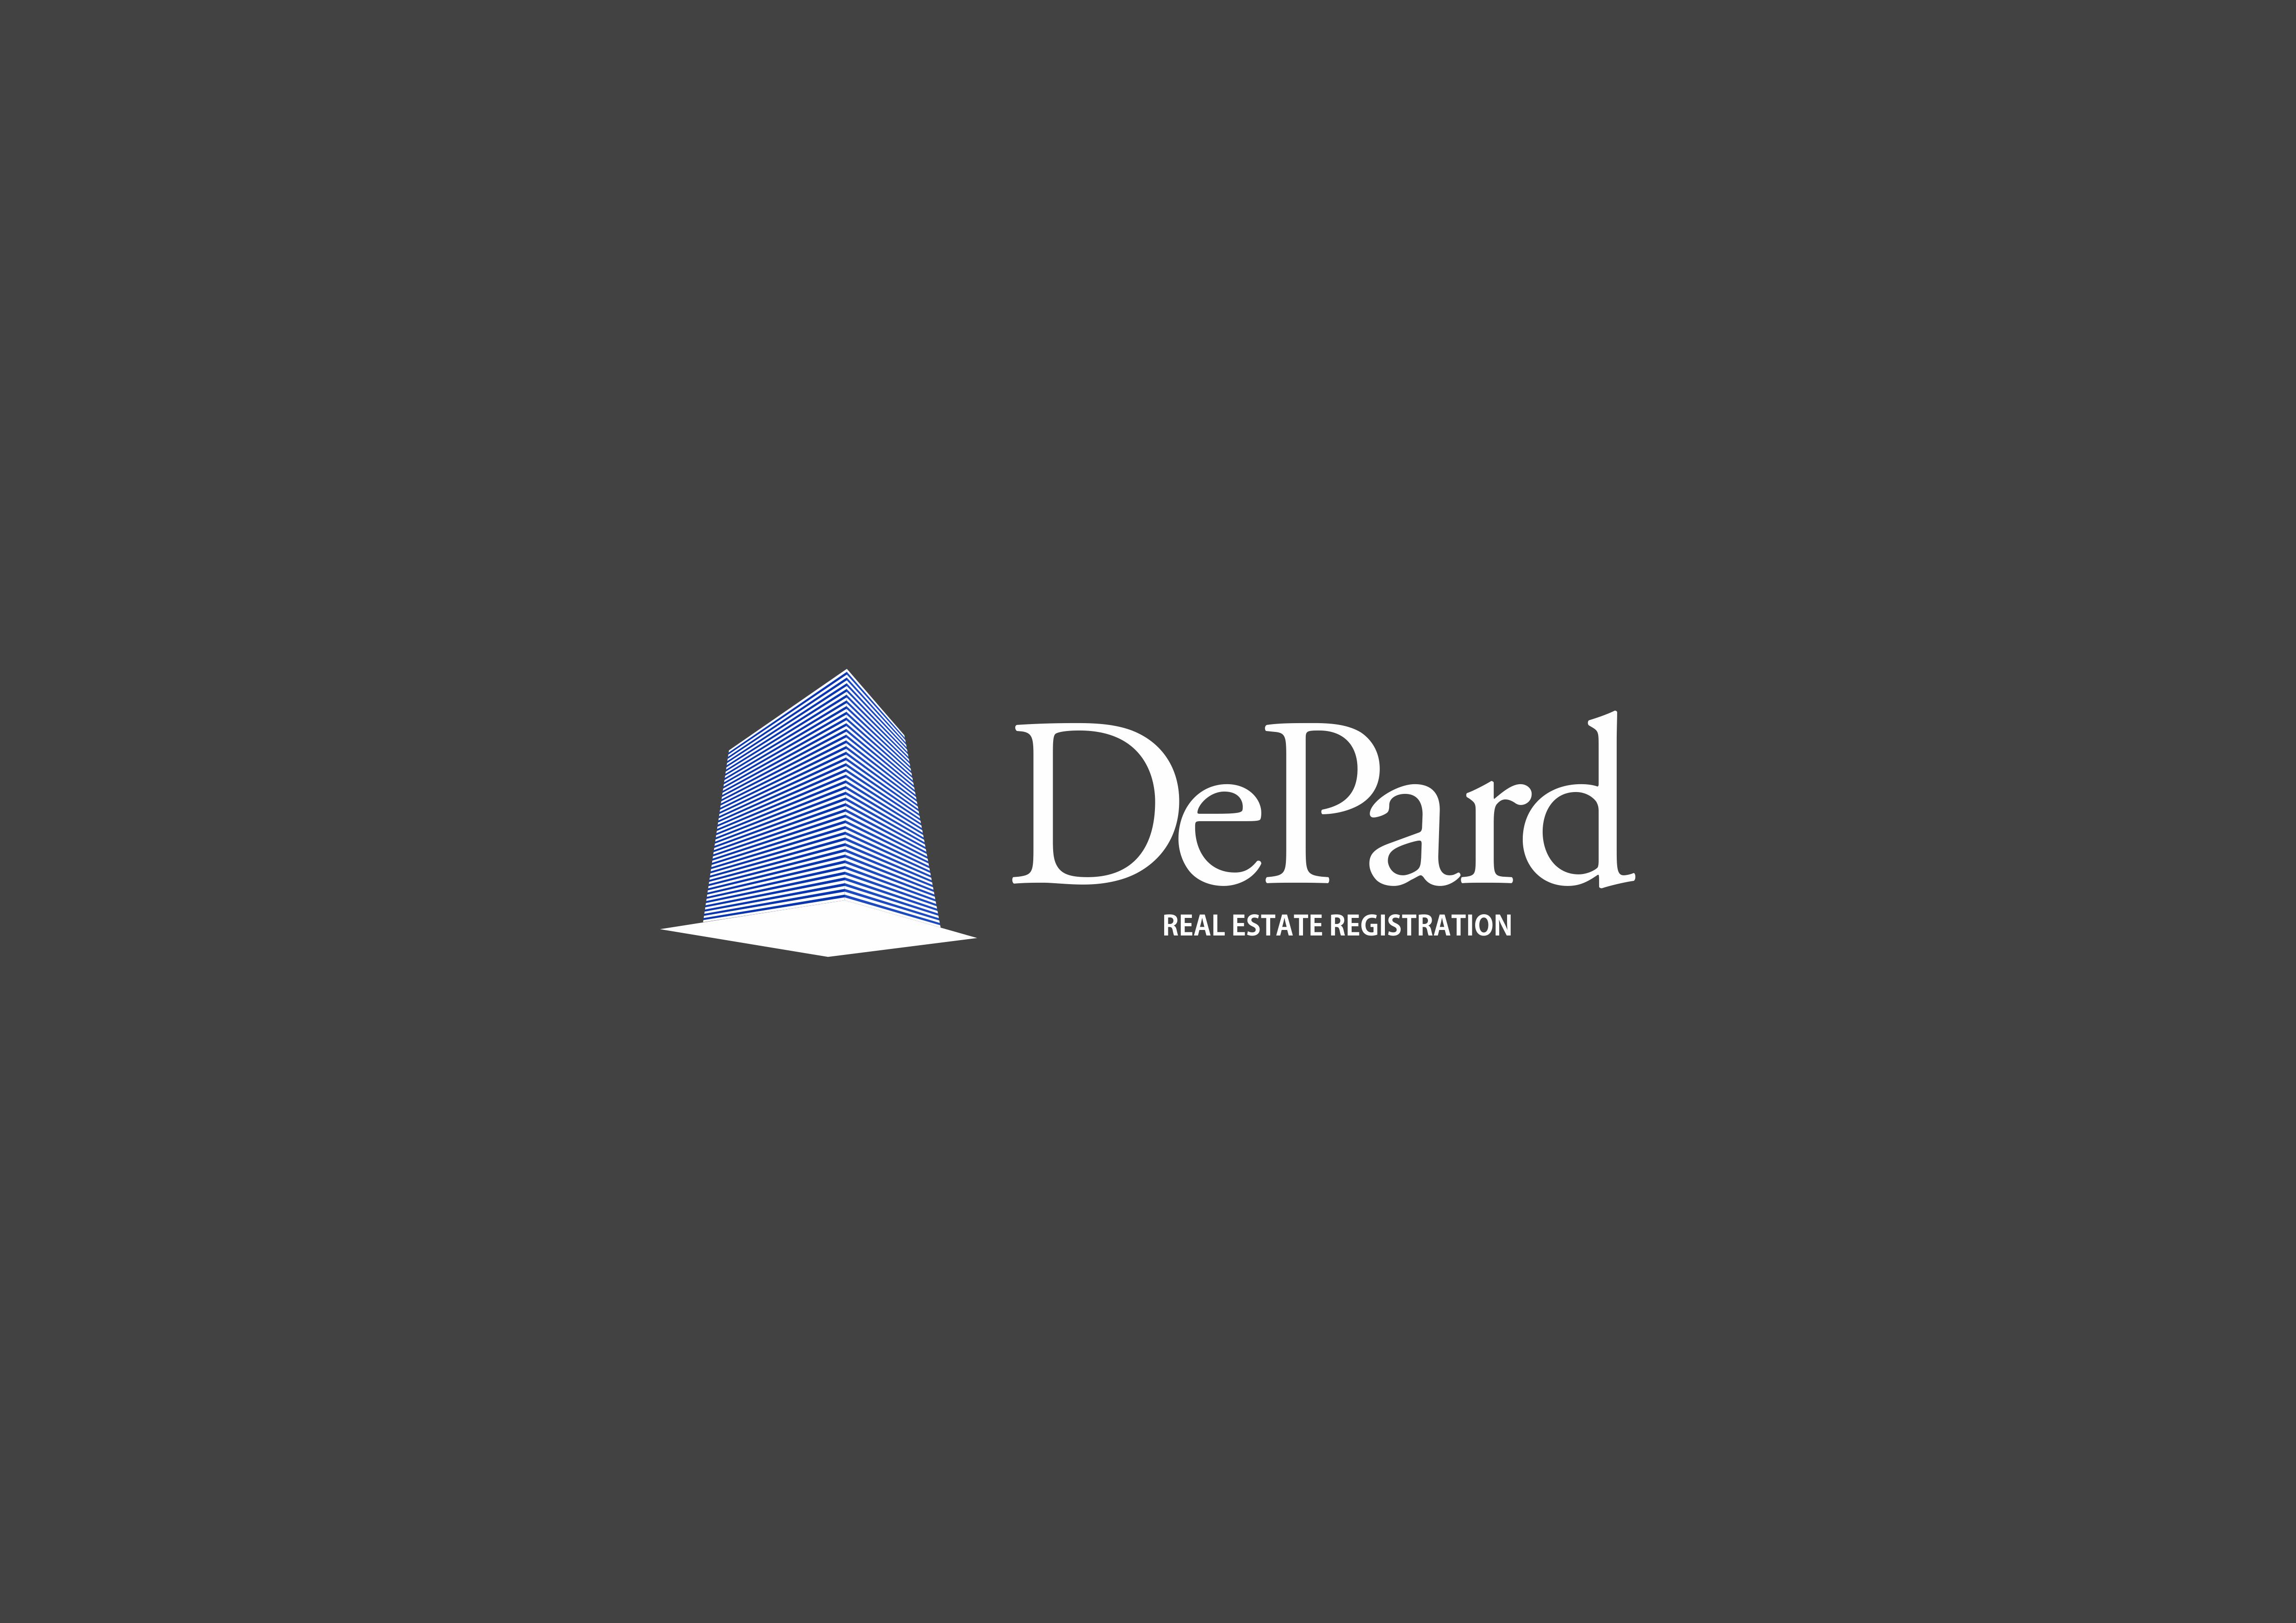 Логотип для компании (услуги недвижимость) фото f_412593532da40a05.png